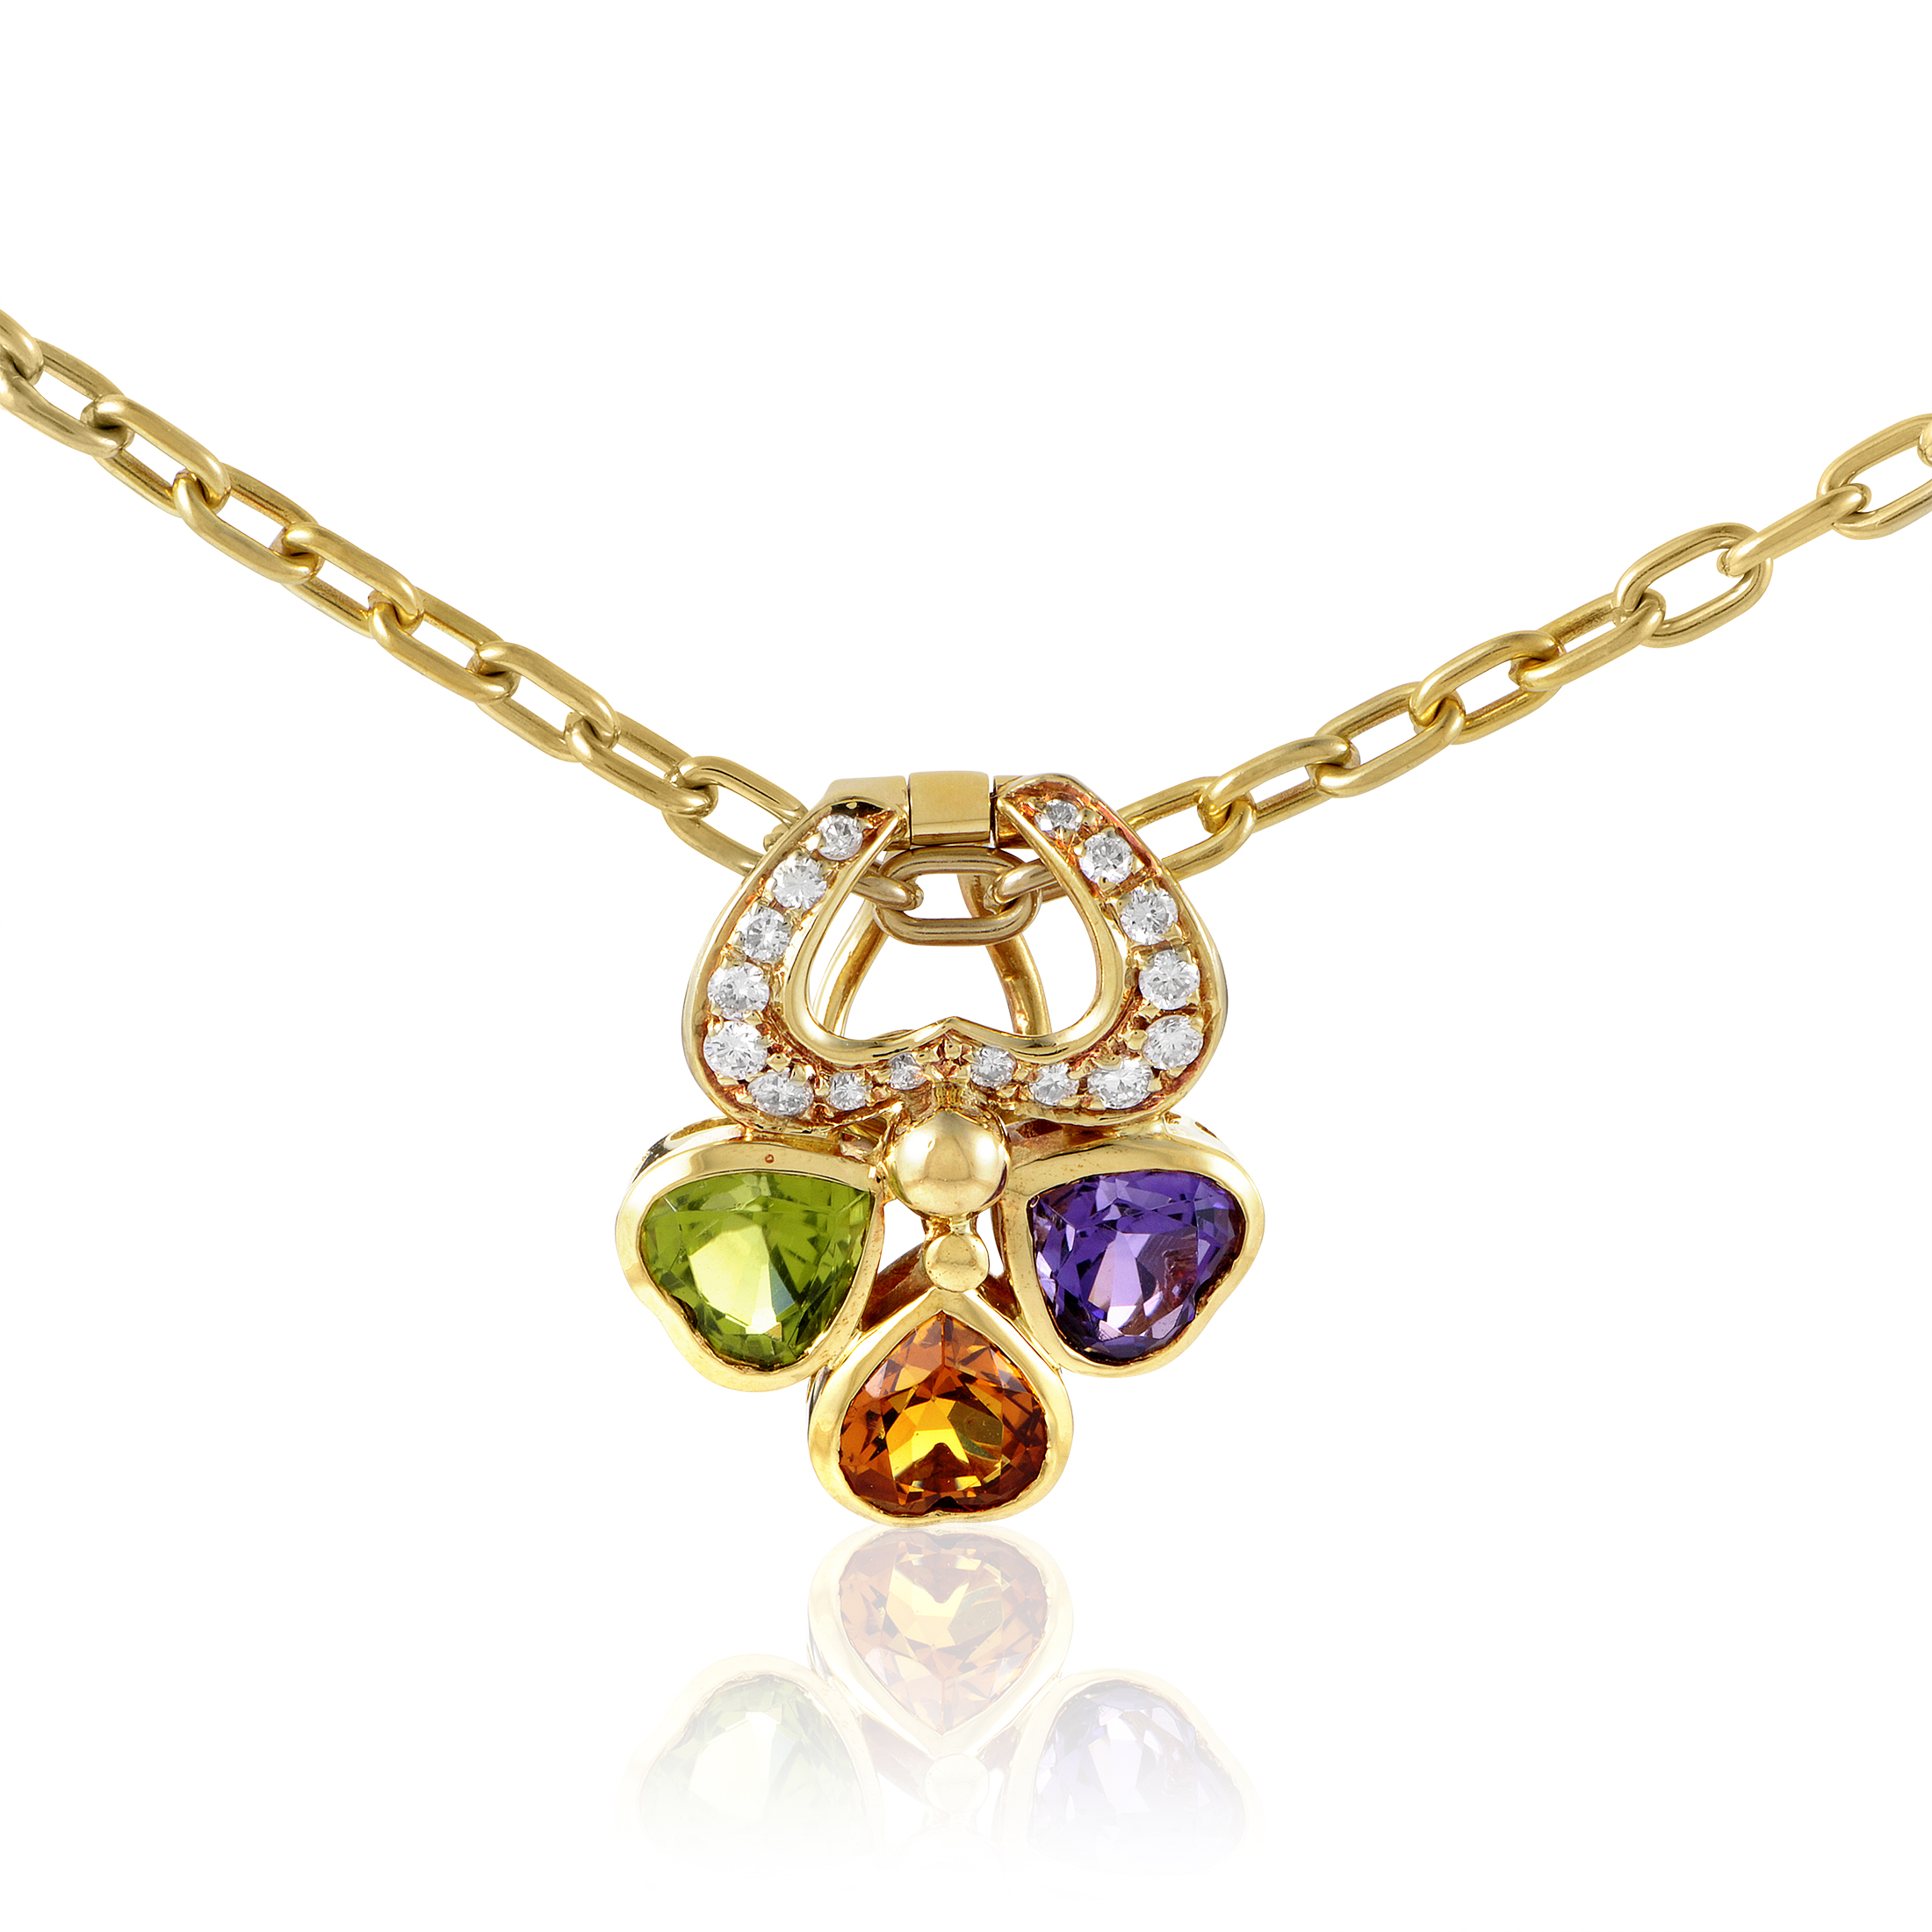 Pomellato Women's 18K Yellow Gold Diamond & Multi-Gemstone Pendant Necklace